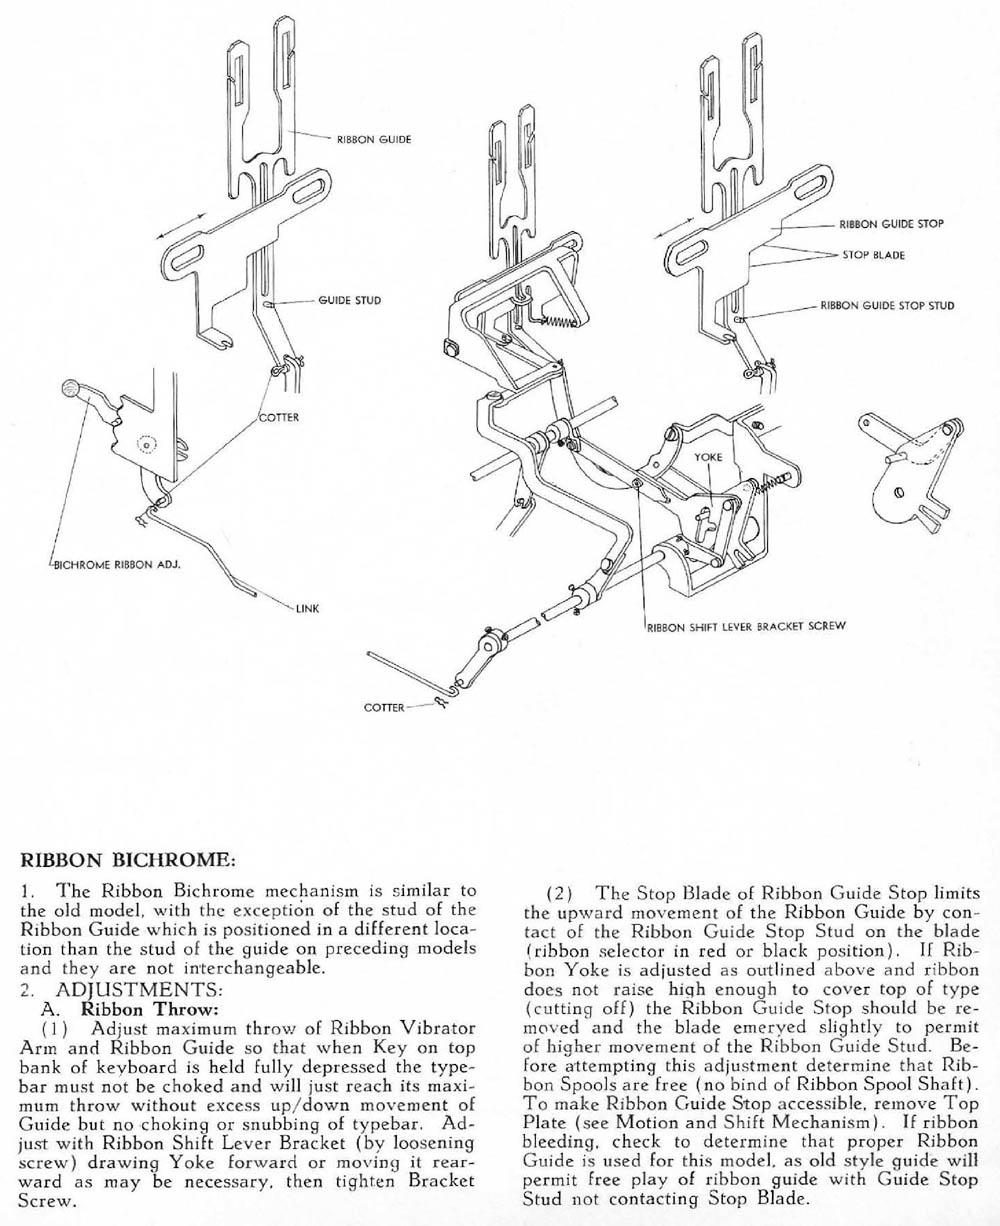 Supplement: Woodstock Segment Shift AMES OAMI Mechanical